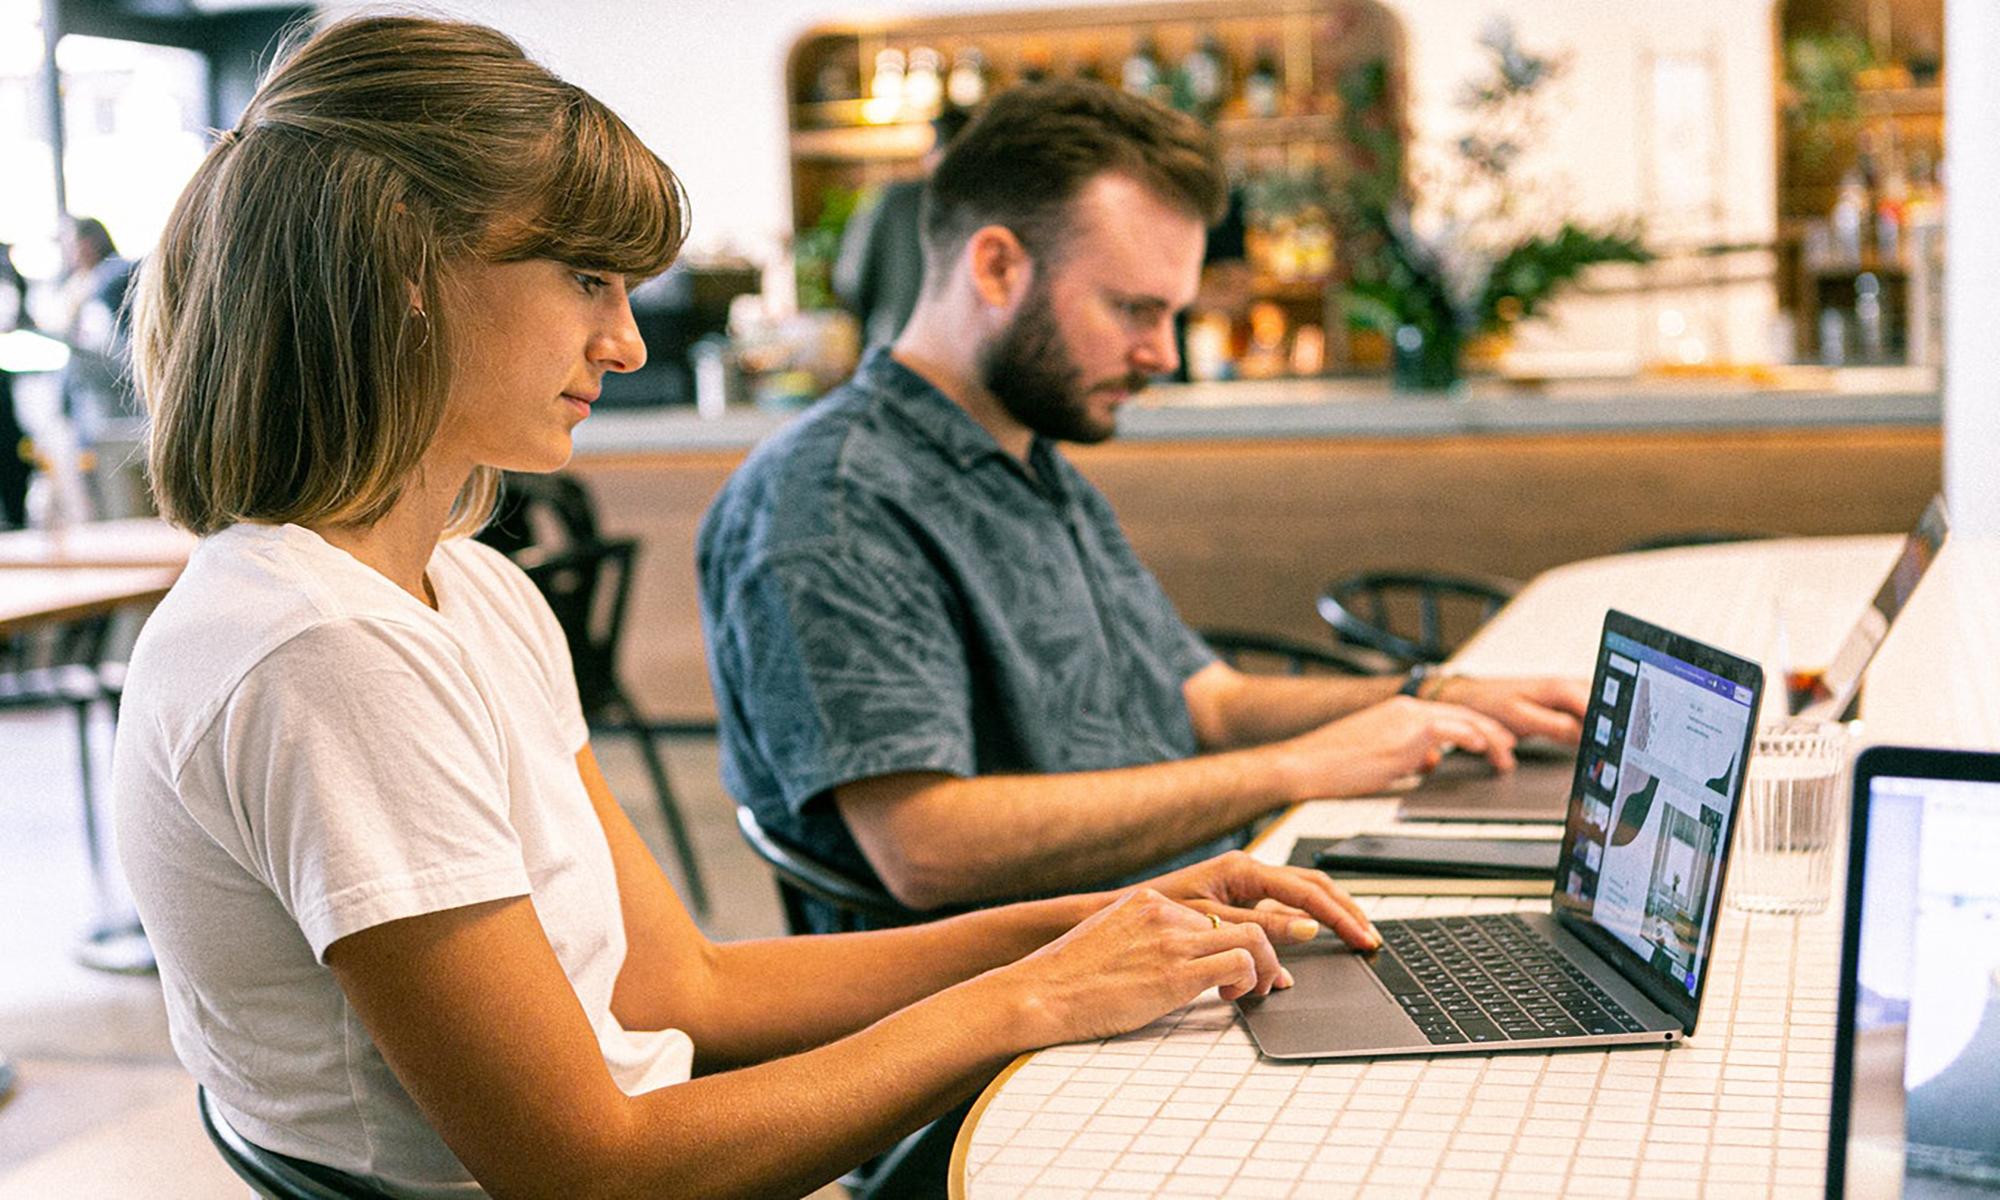 photo-of-woman-using-laptop-3194518 - Workspace Digital